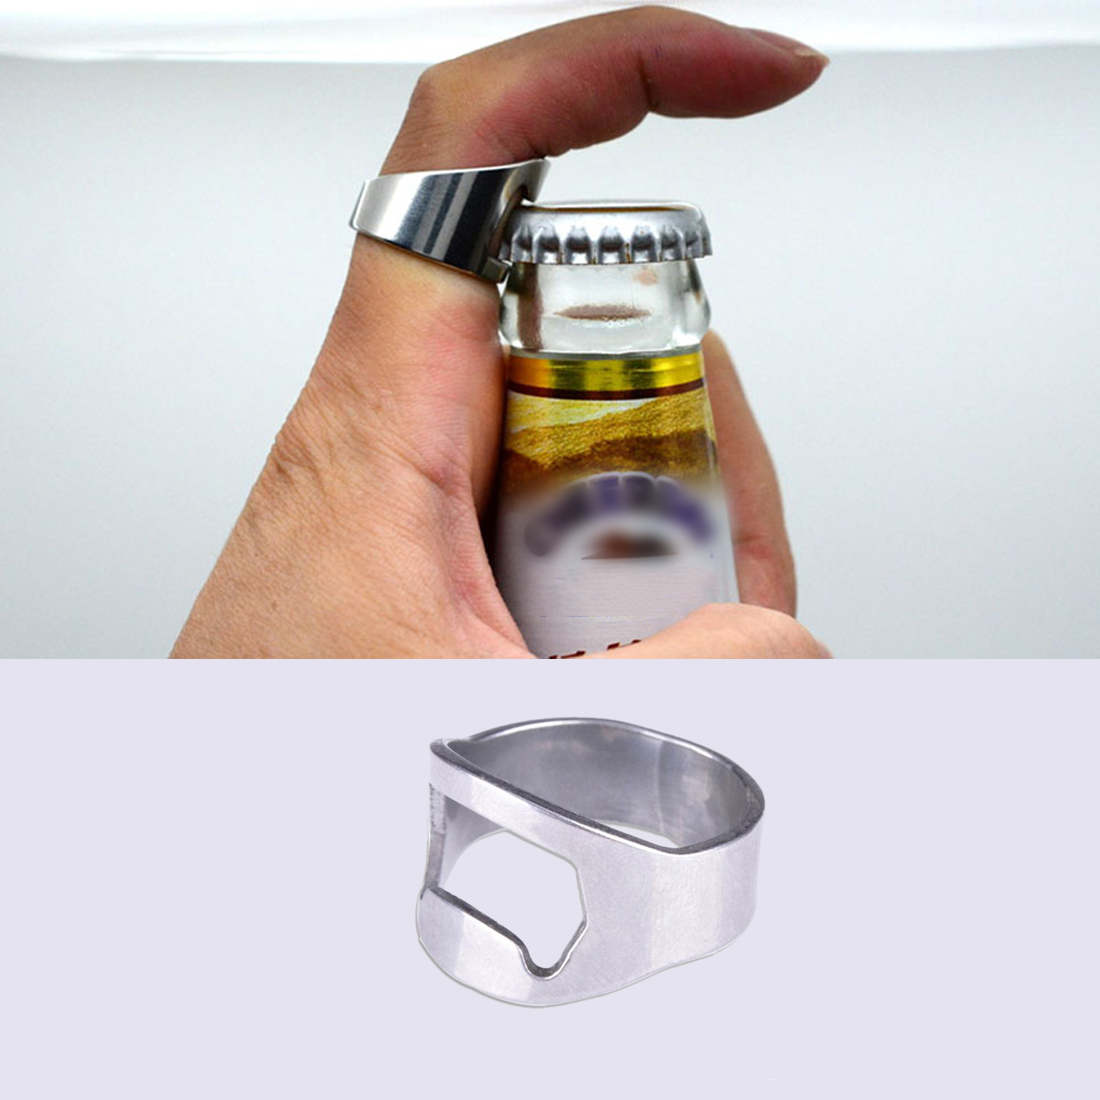 1pcs 20mm New Arrival Creative Versatile Stainless Steel Colorful Finger Ring Ring-Shape Beer Bottle Opener